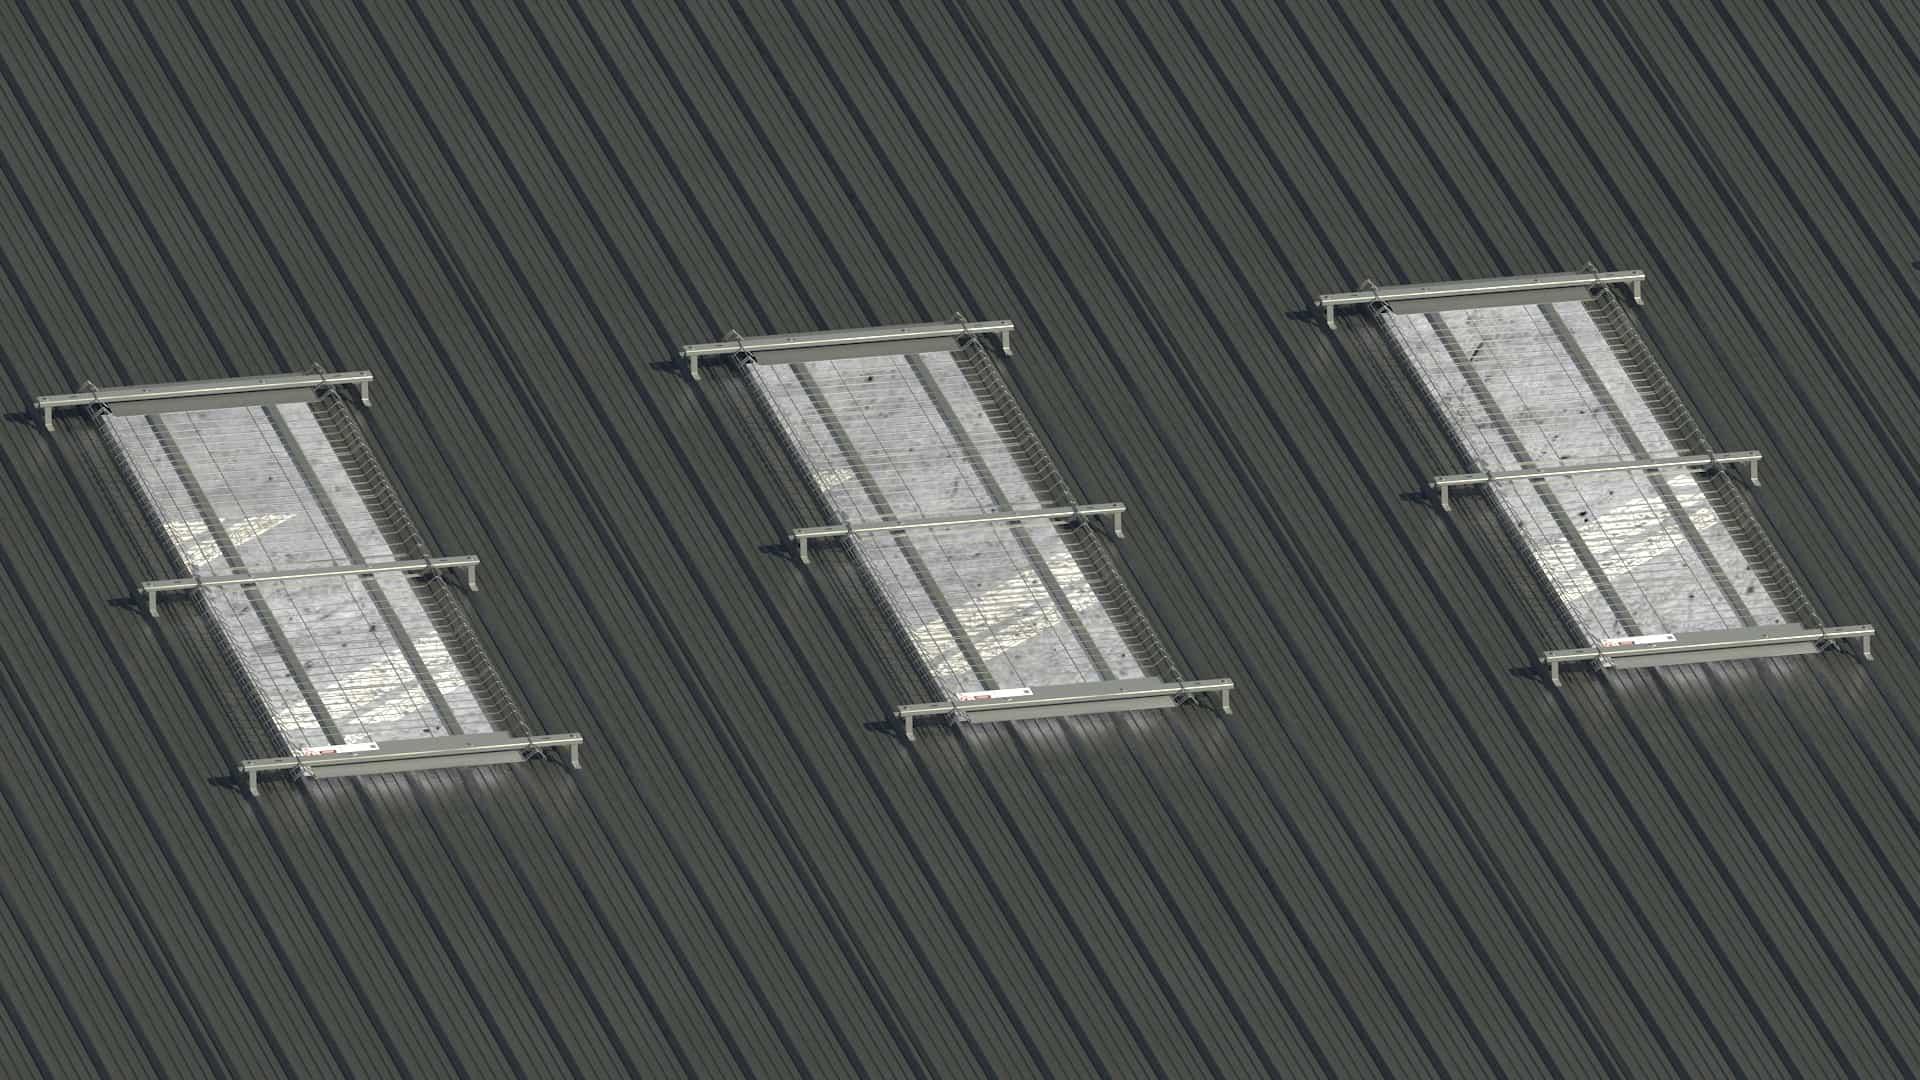 Skylight TSS roof safety system roof netting fall protection fall arrest system skyguard Saudi Arabia UAE Bahrain Qatar Oman Iraq Turkey Dubai abu dhabi sharjah 2